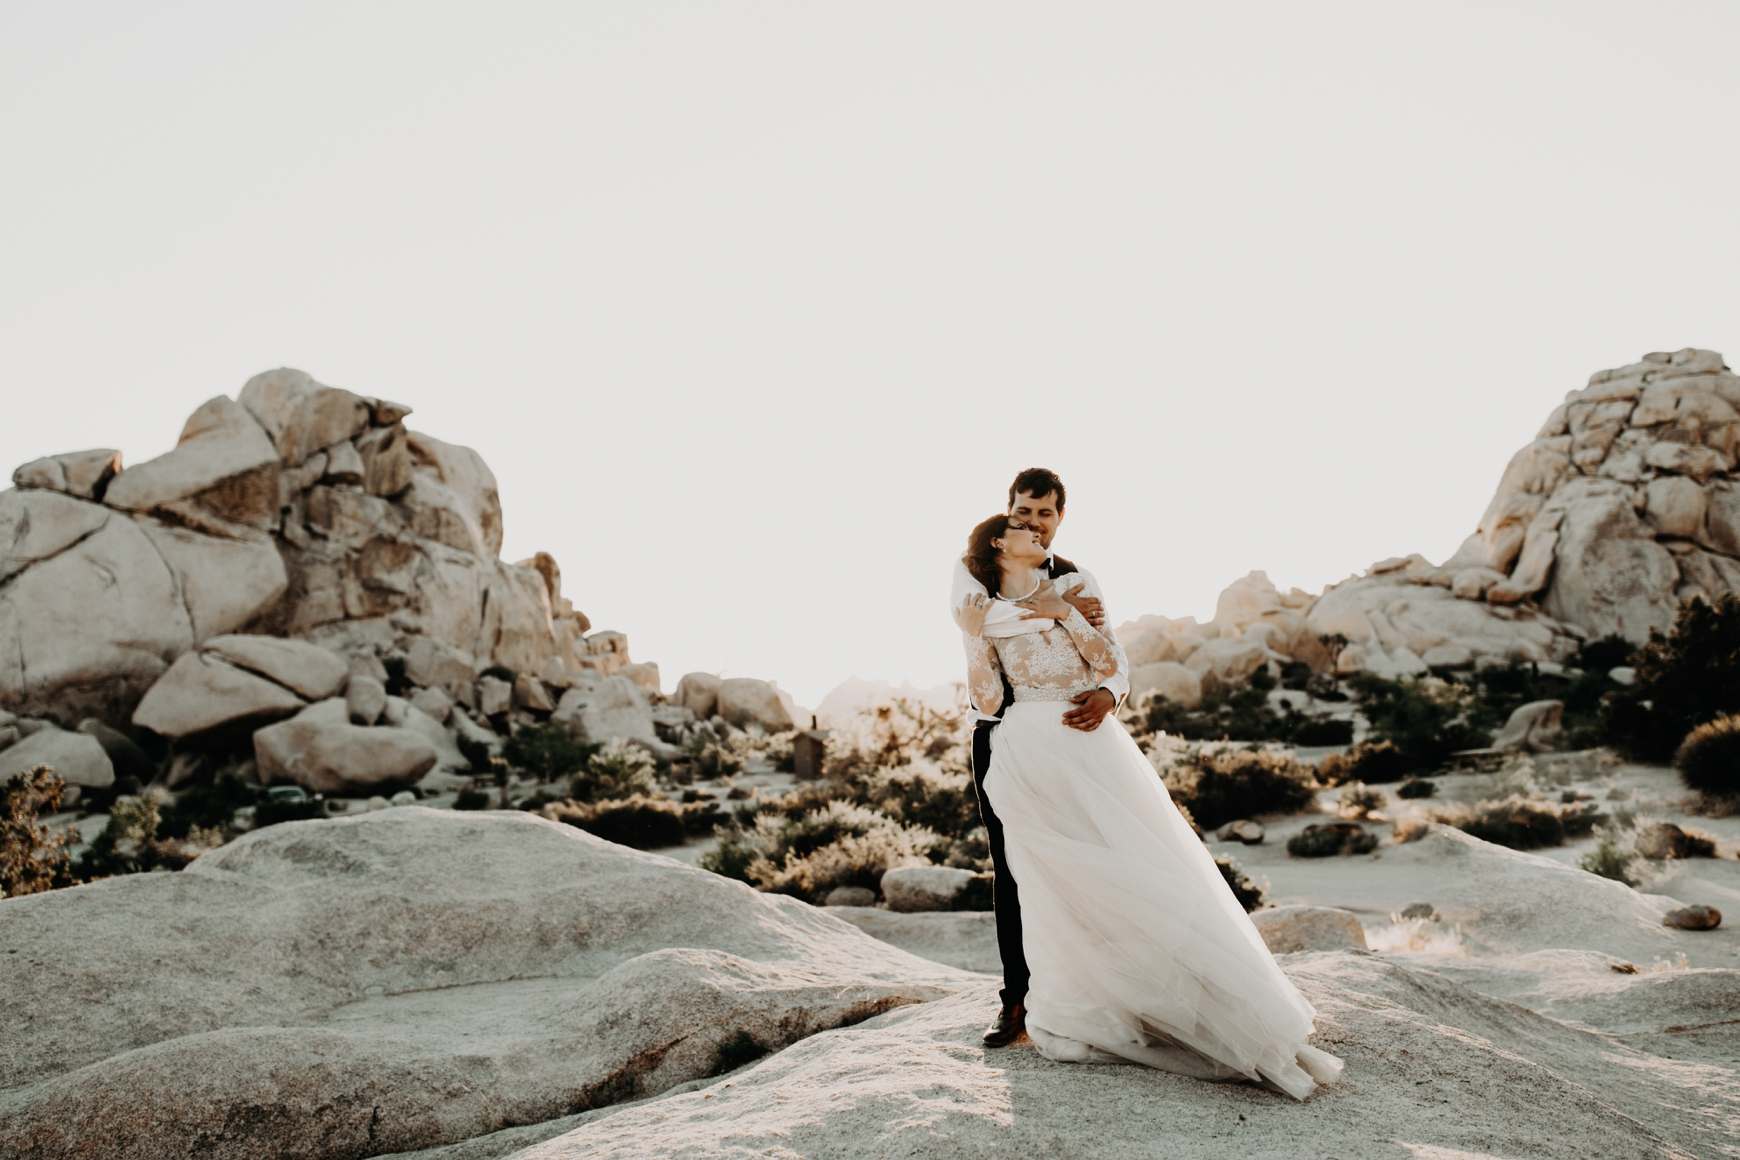 Joshua Tree Bridal Portraits Anastasia & Andrey Emily Magers Photography-281.jpg